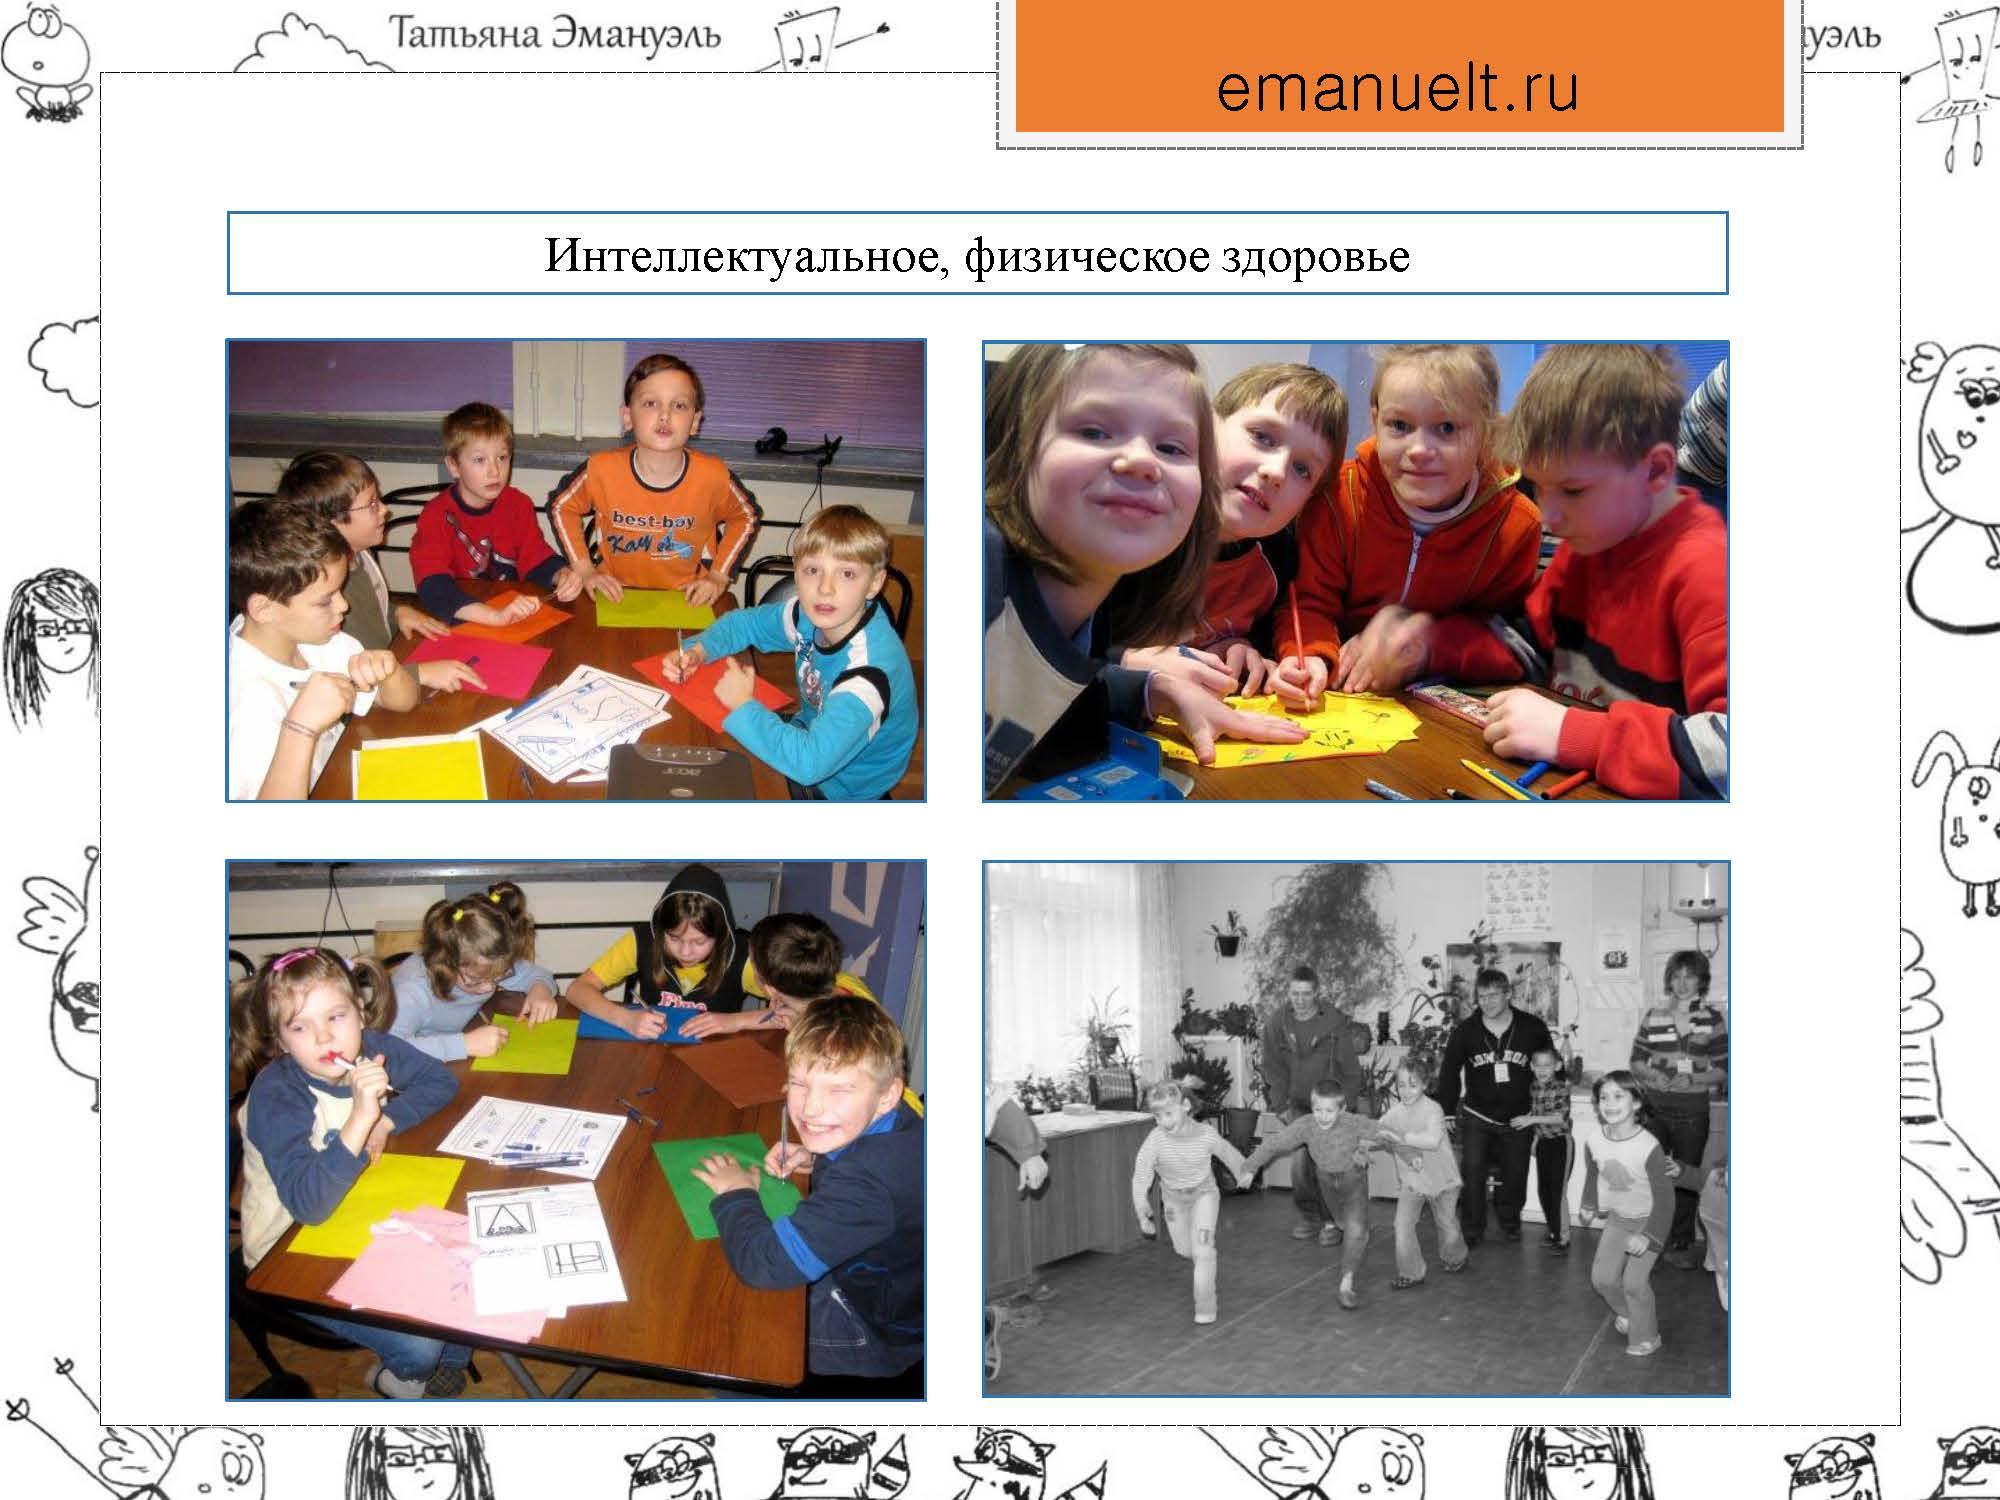 RazBeG_Emanuel_Страница_21